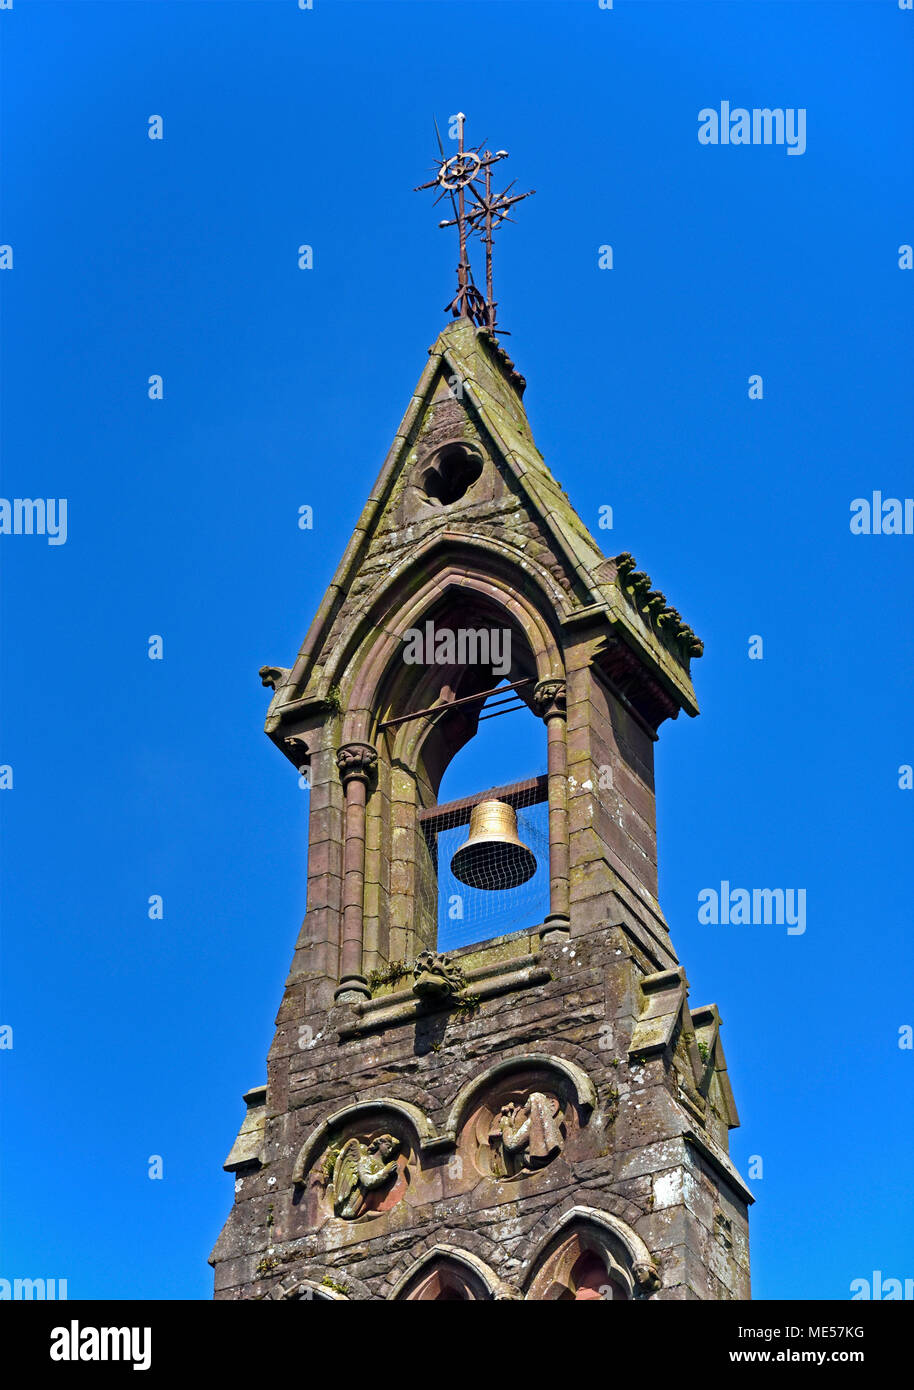 Detail of Bellcote. Church of Saint Mary (Roman Catholic). Cleator, Cumbria, England, United Kingdom, Europe. - Stock Image